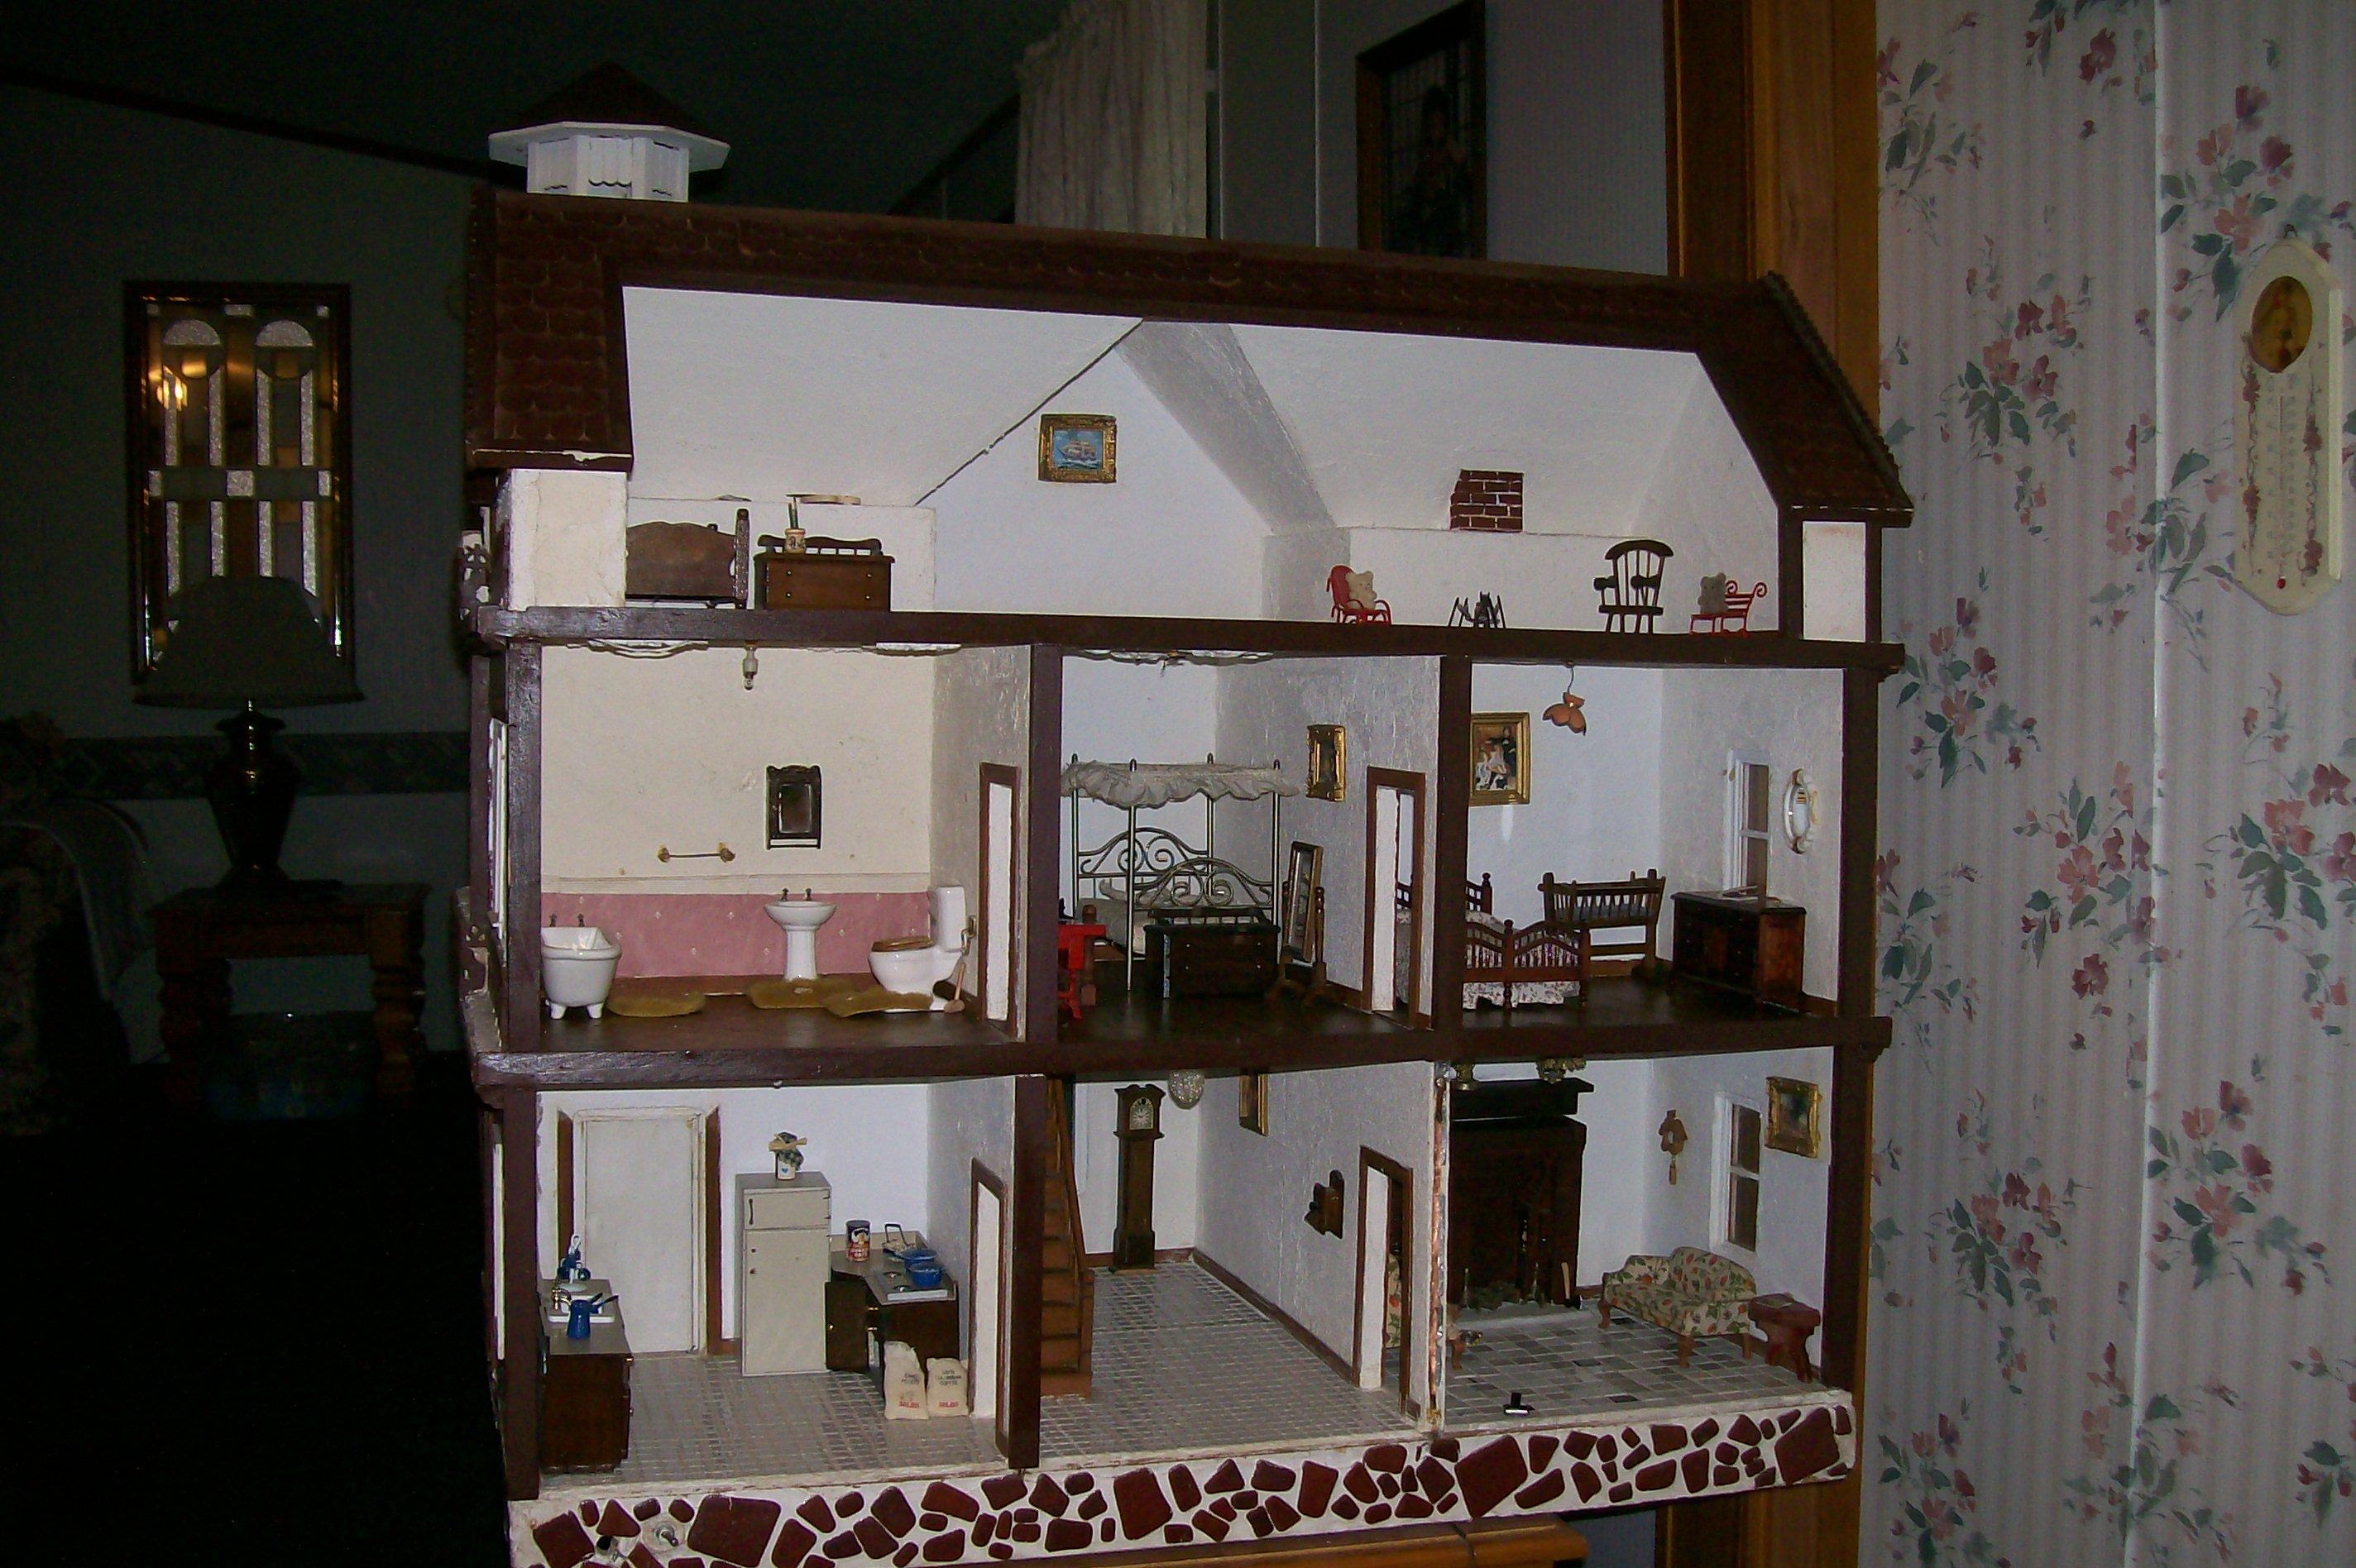 Antique Dolls House Furniture For Sale 28 Images Dollhouse Furniture For Sale 28 Images 1 12